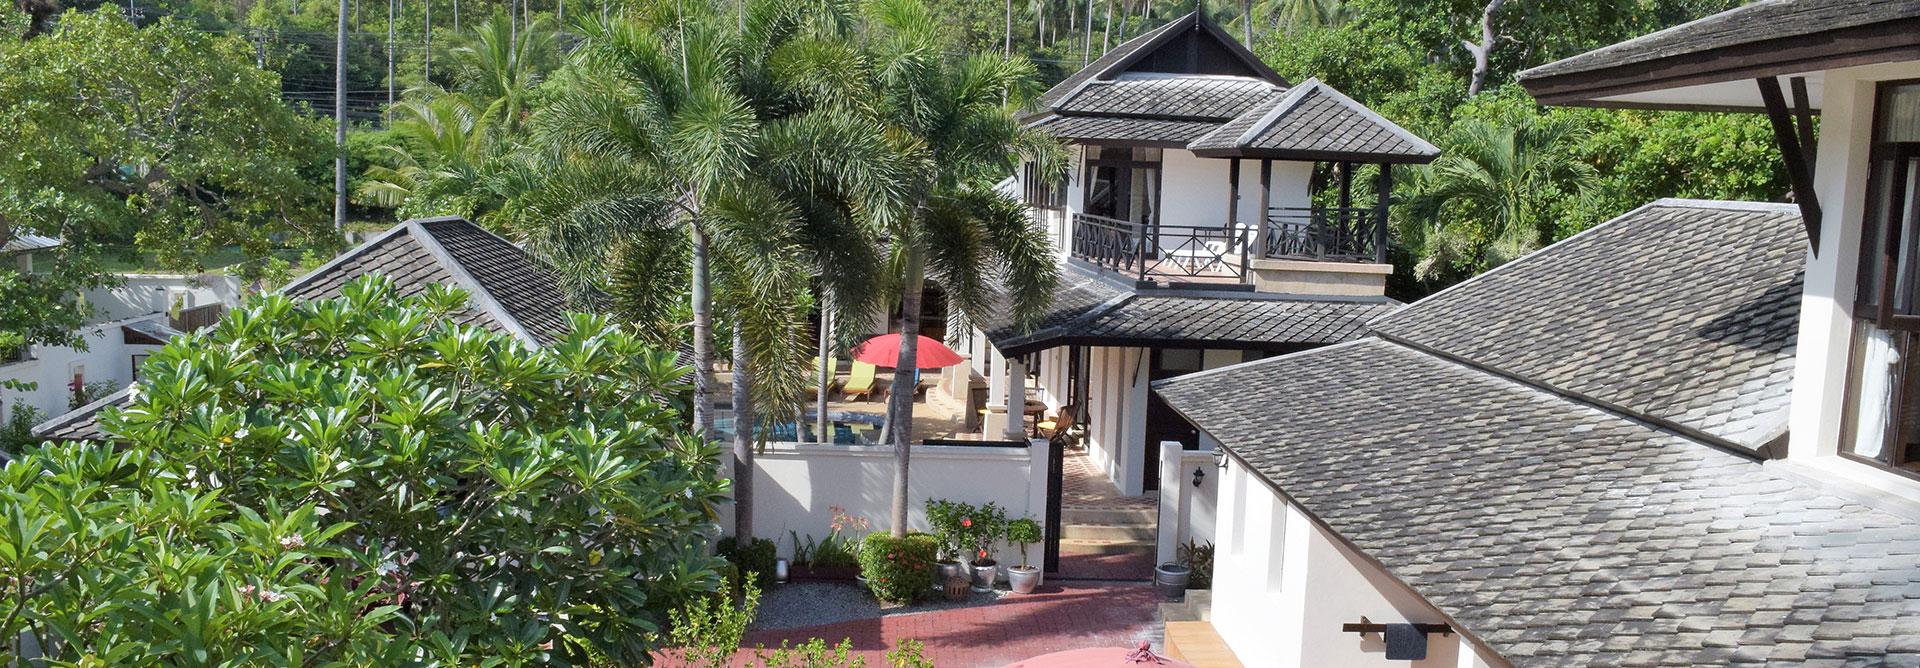 Banyan Villas Koh Samui Thailand